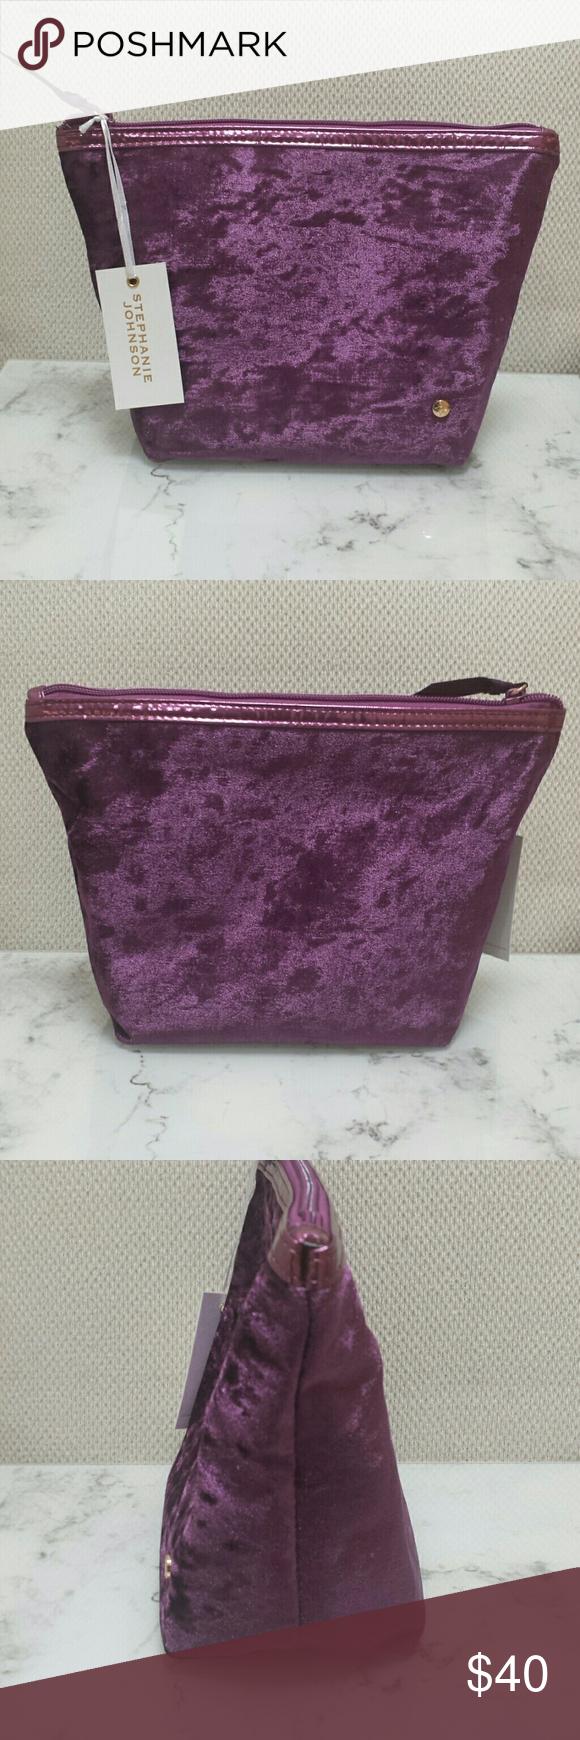 Stephanie Johnson Laura Trapezoid Cosmetics Bag Bag is new